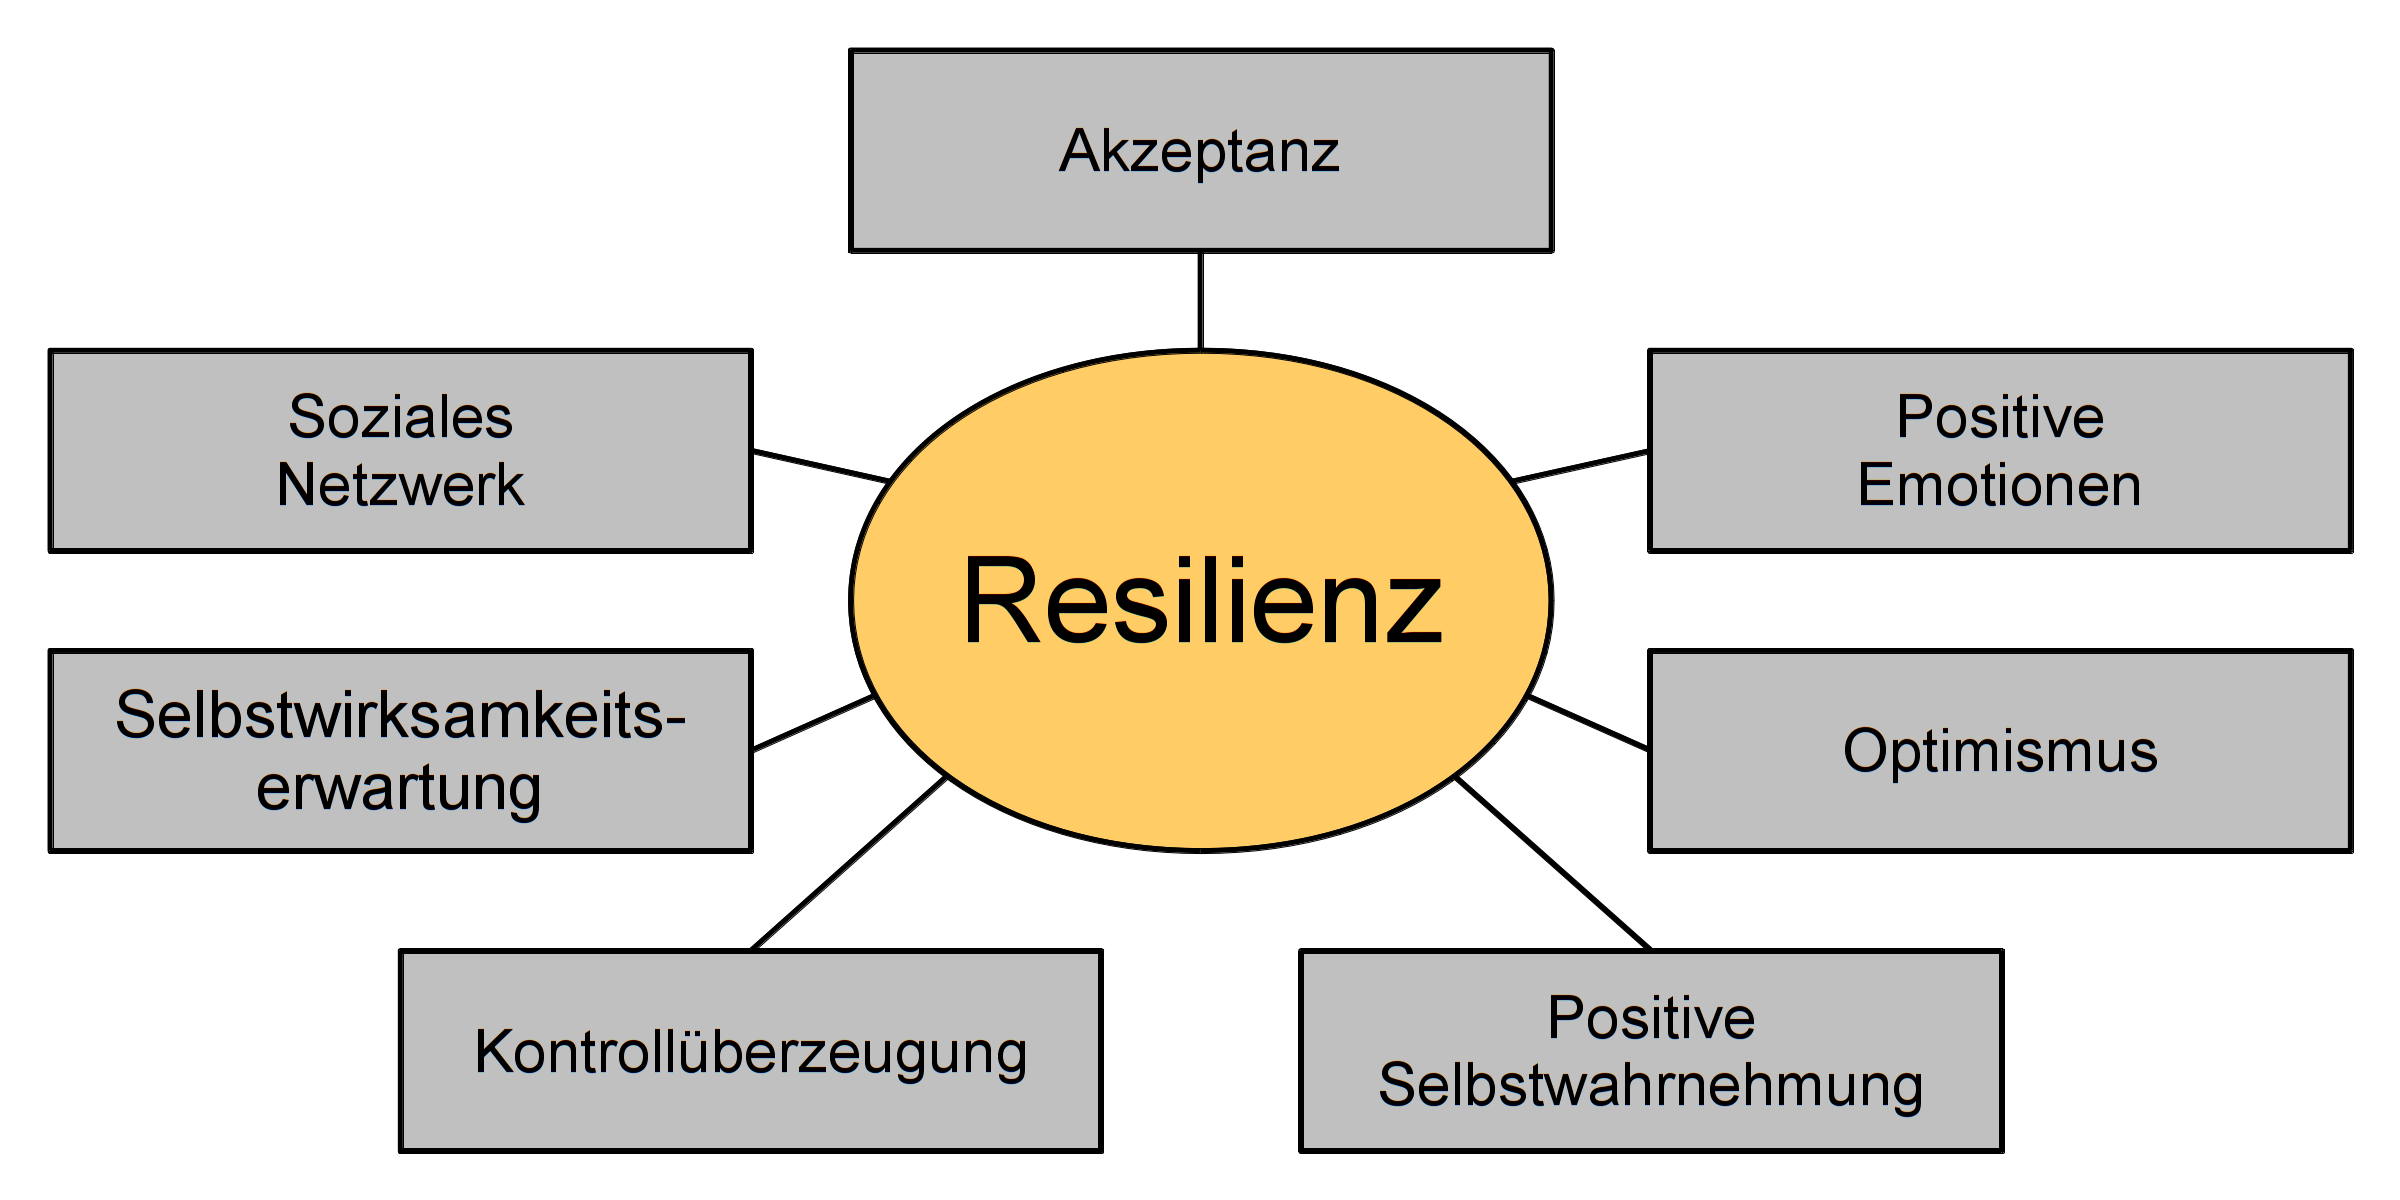 resilienz mit bungen die resilienz f rdern business. Black Bedroom Furniture Sets. Home Design Ideas